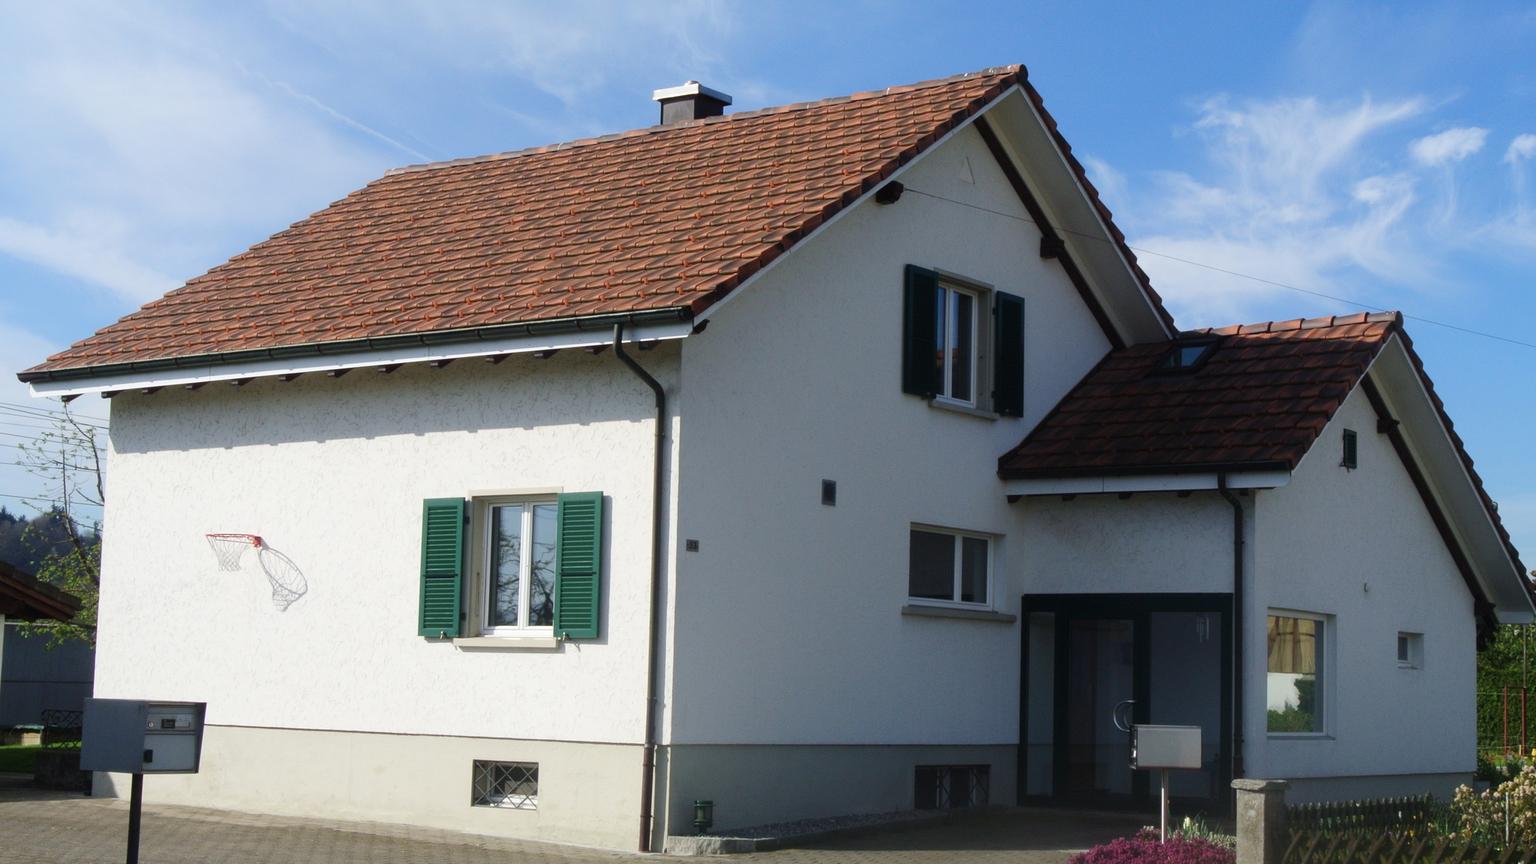 dachsanierungen dachstockausbau hausanbauten zofingen aarau aargau oberaargau solothurn. Black Bedroom Furniture Sets. Home Design Ideas